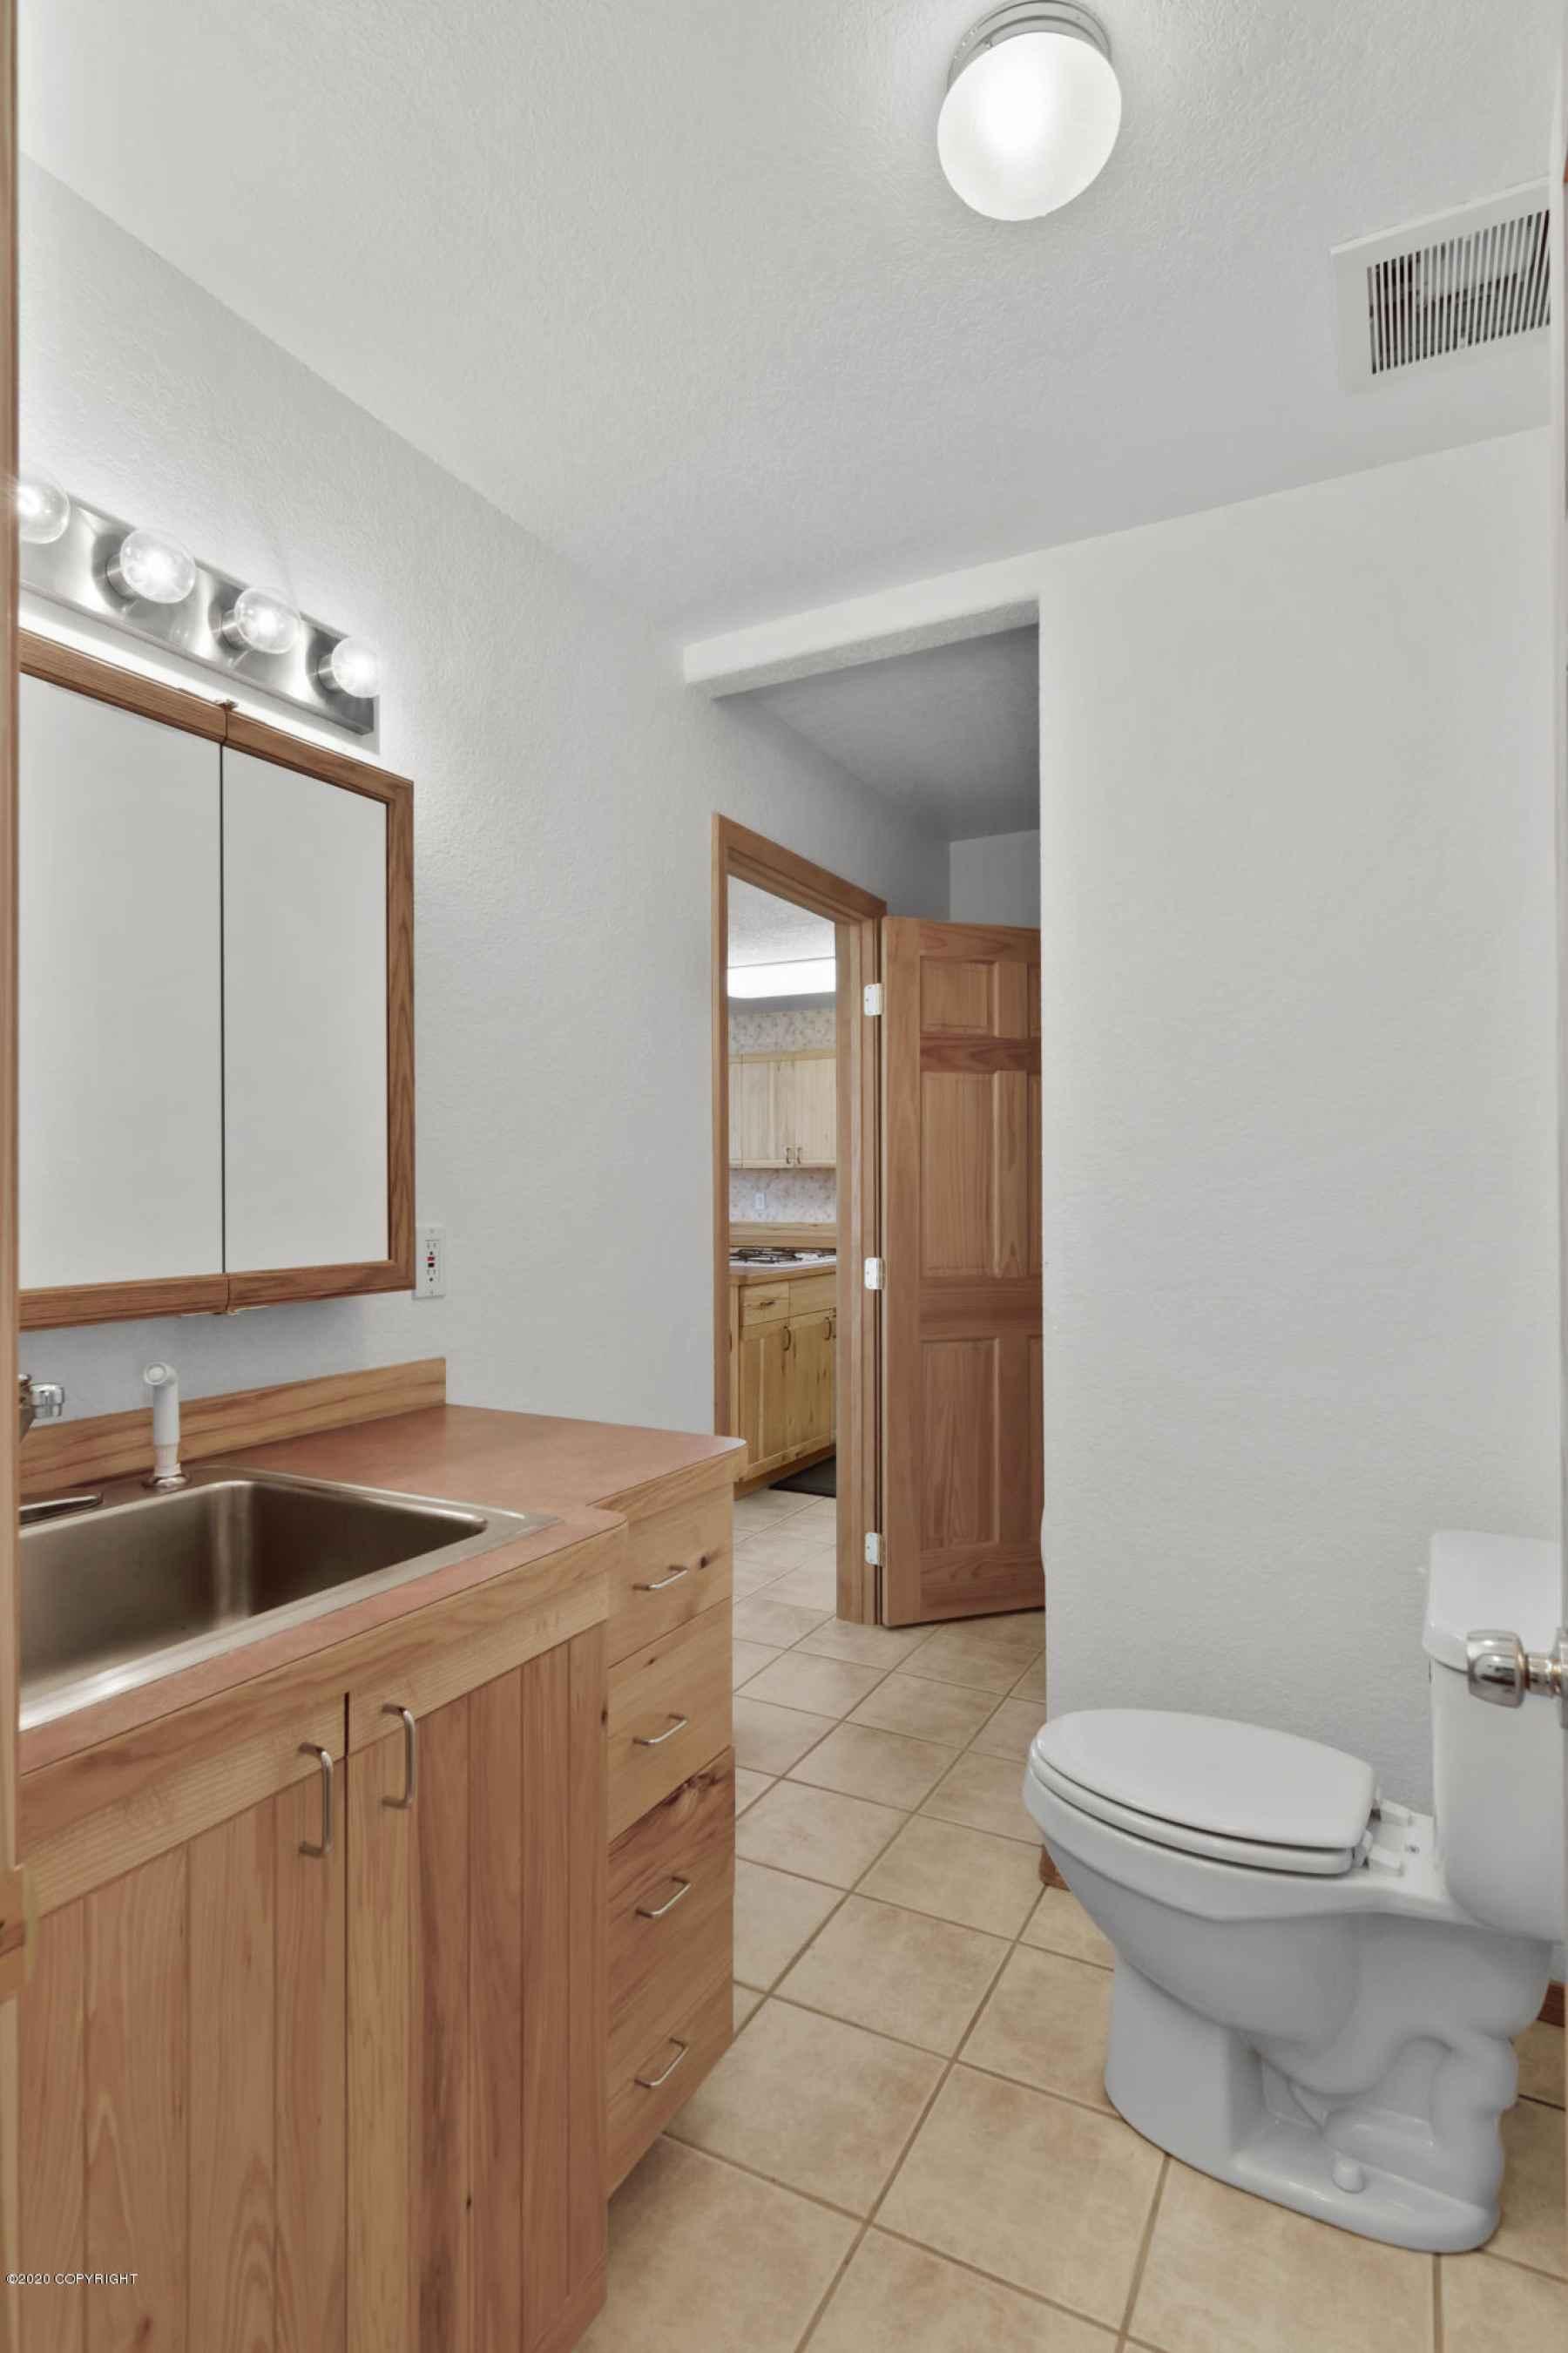 Downstairs 1/2 Bath & Laundry